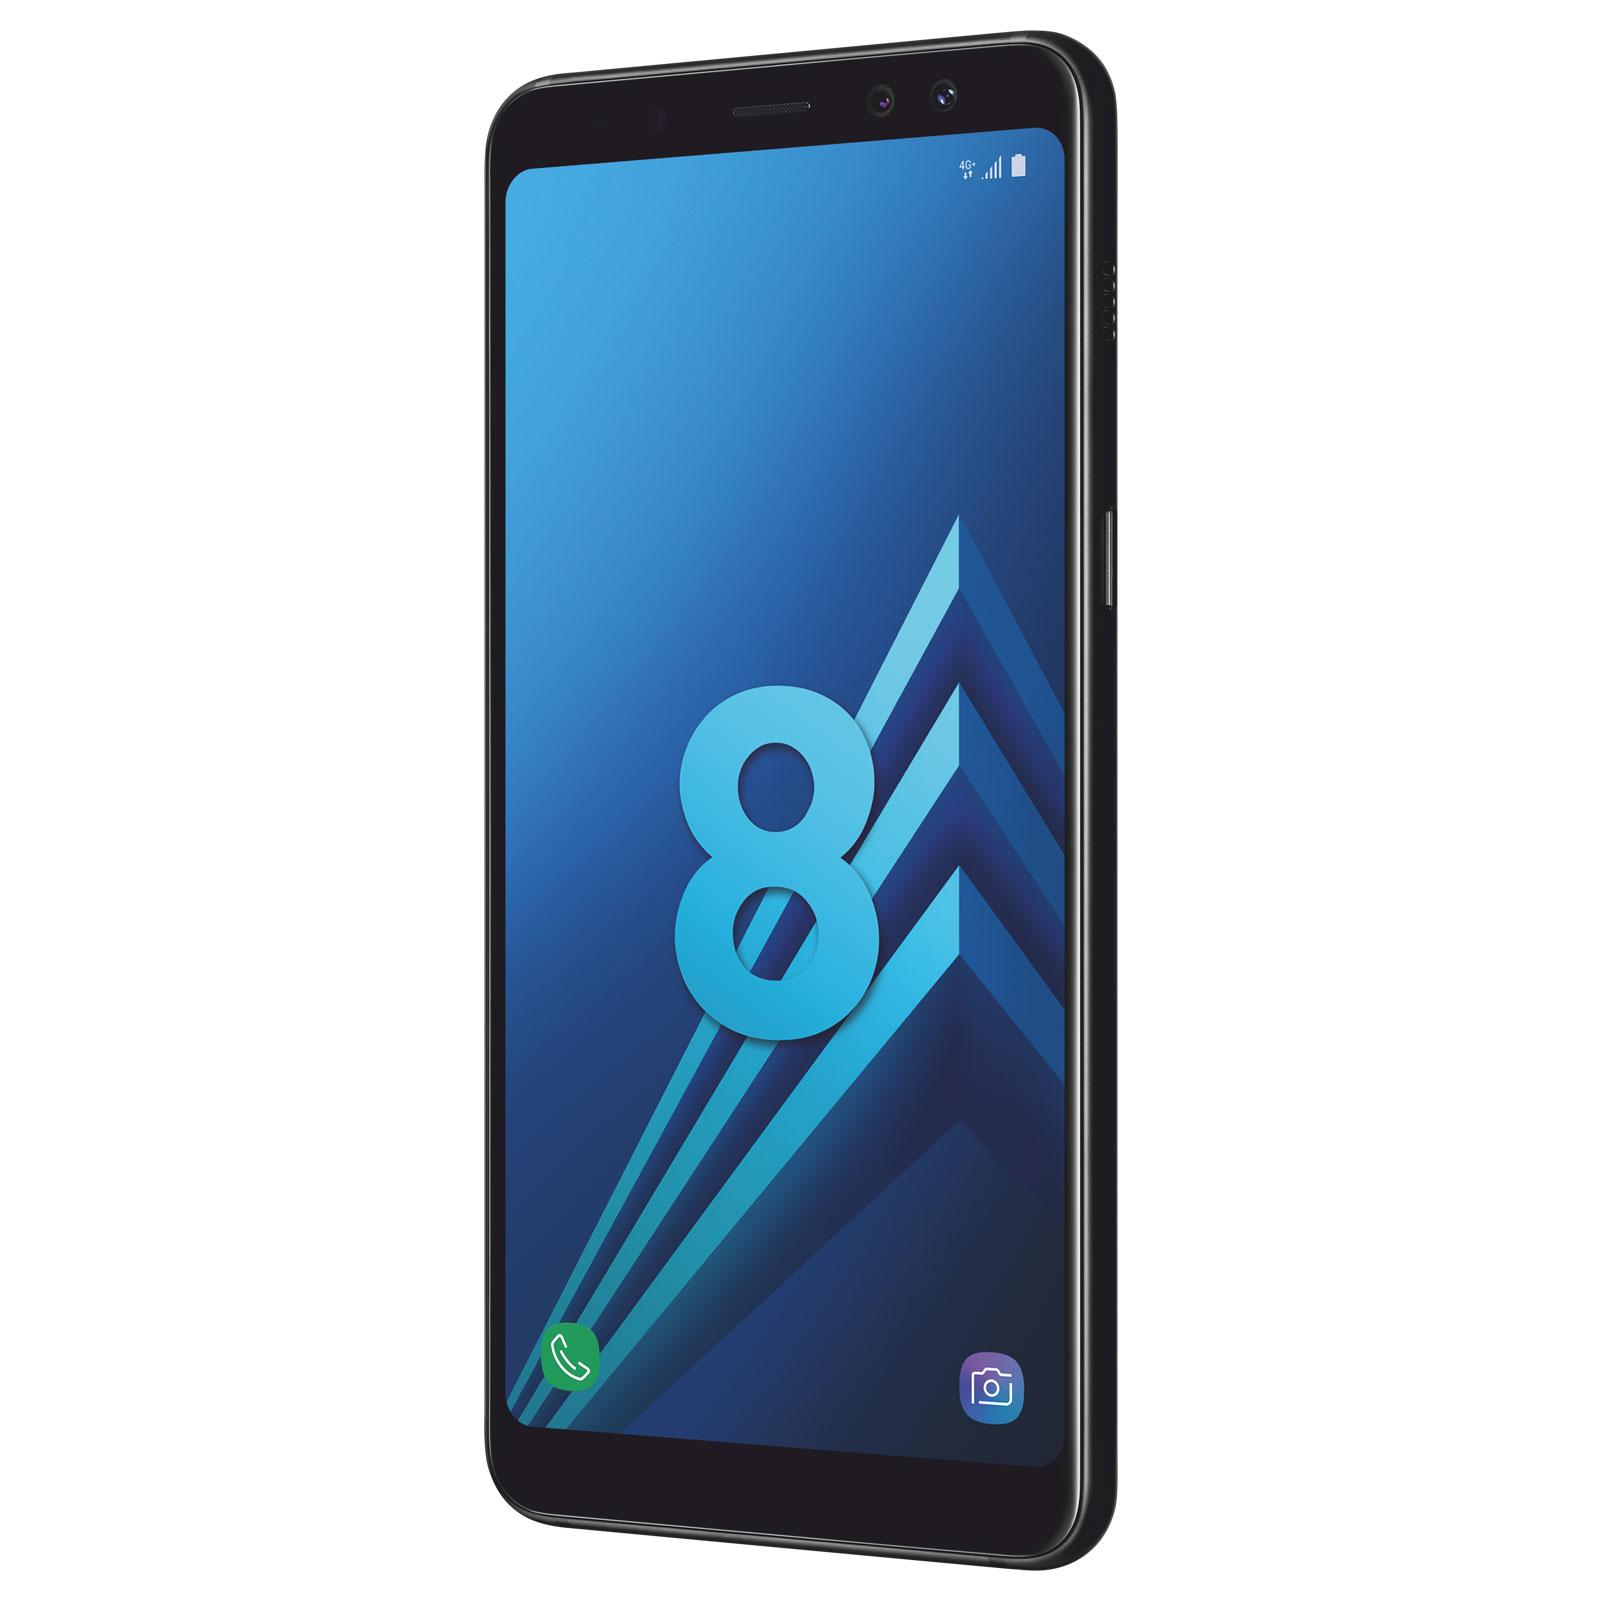 Samsung Galaxy A8 A530 32Go Noir Dual Sim (SM-A530FZKDXEF) - Achat / Vente Téléphonie sur Cybertek.fr - 3